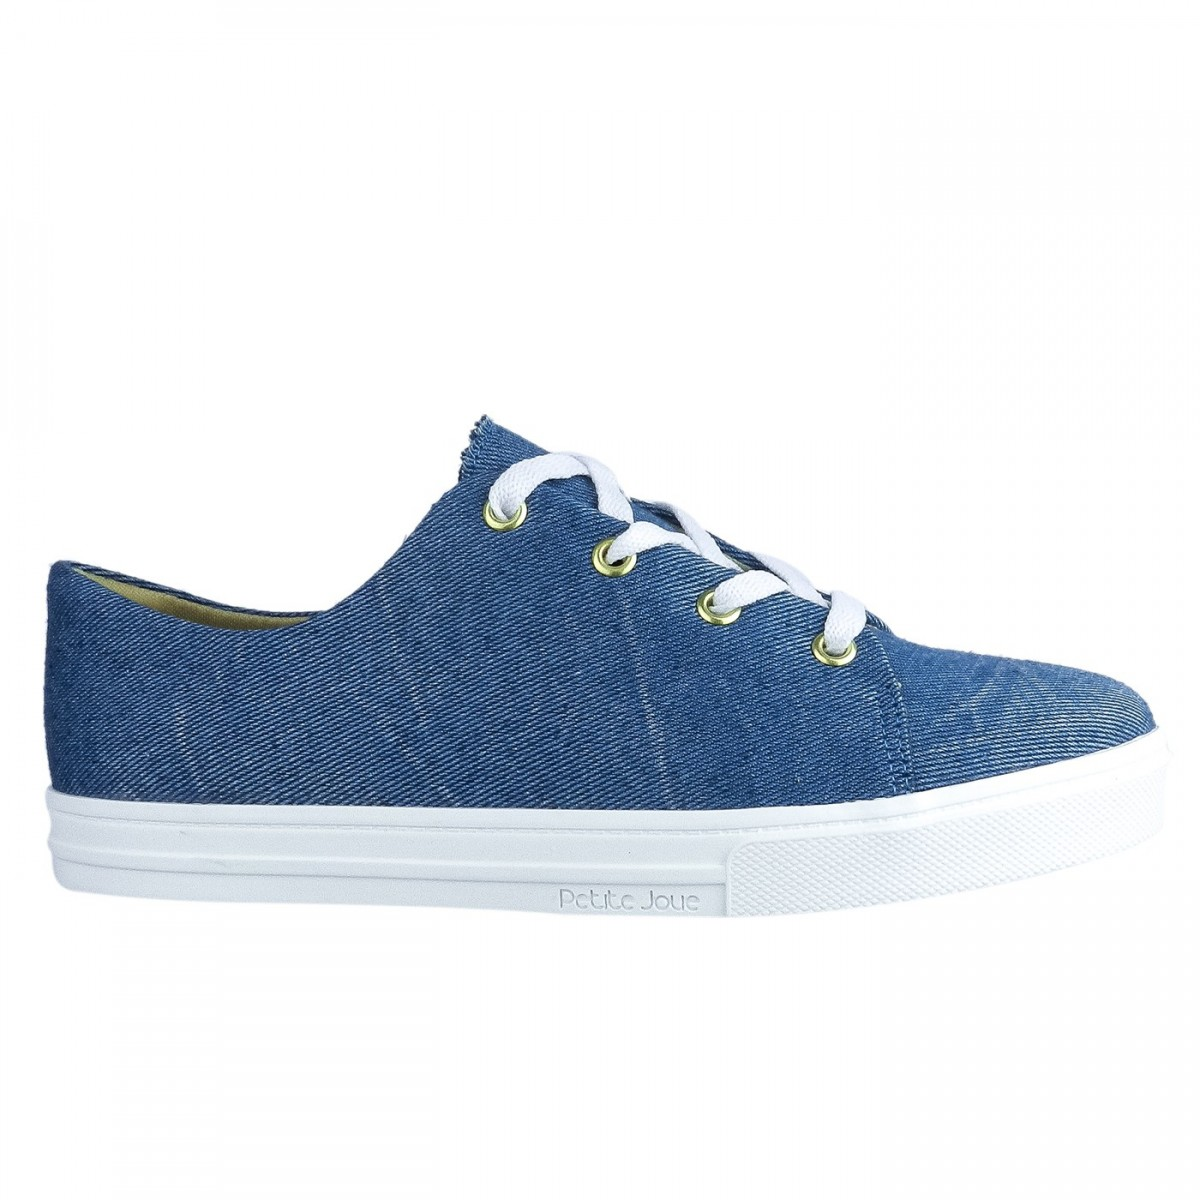 f92bb4ed5f3 Bizz Store - Tênis Feminino Petite Jolie Jeans Tecido Azul